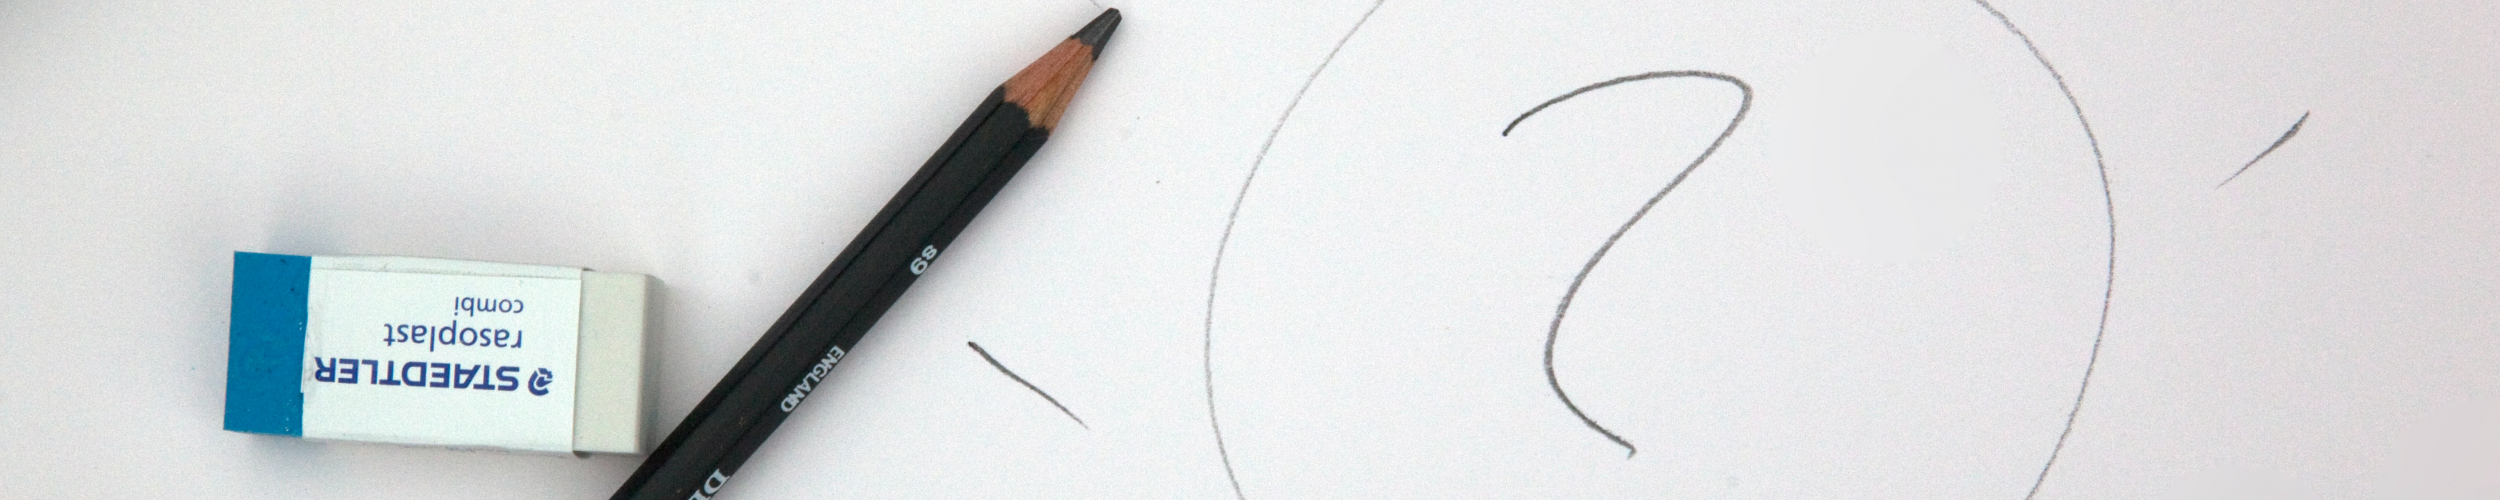 Workshop: Hoe bouw je autoriteit op online?